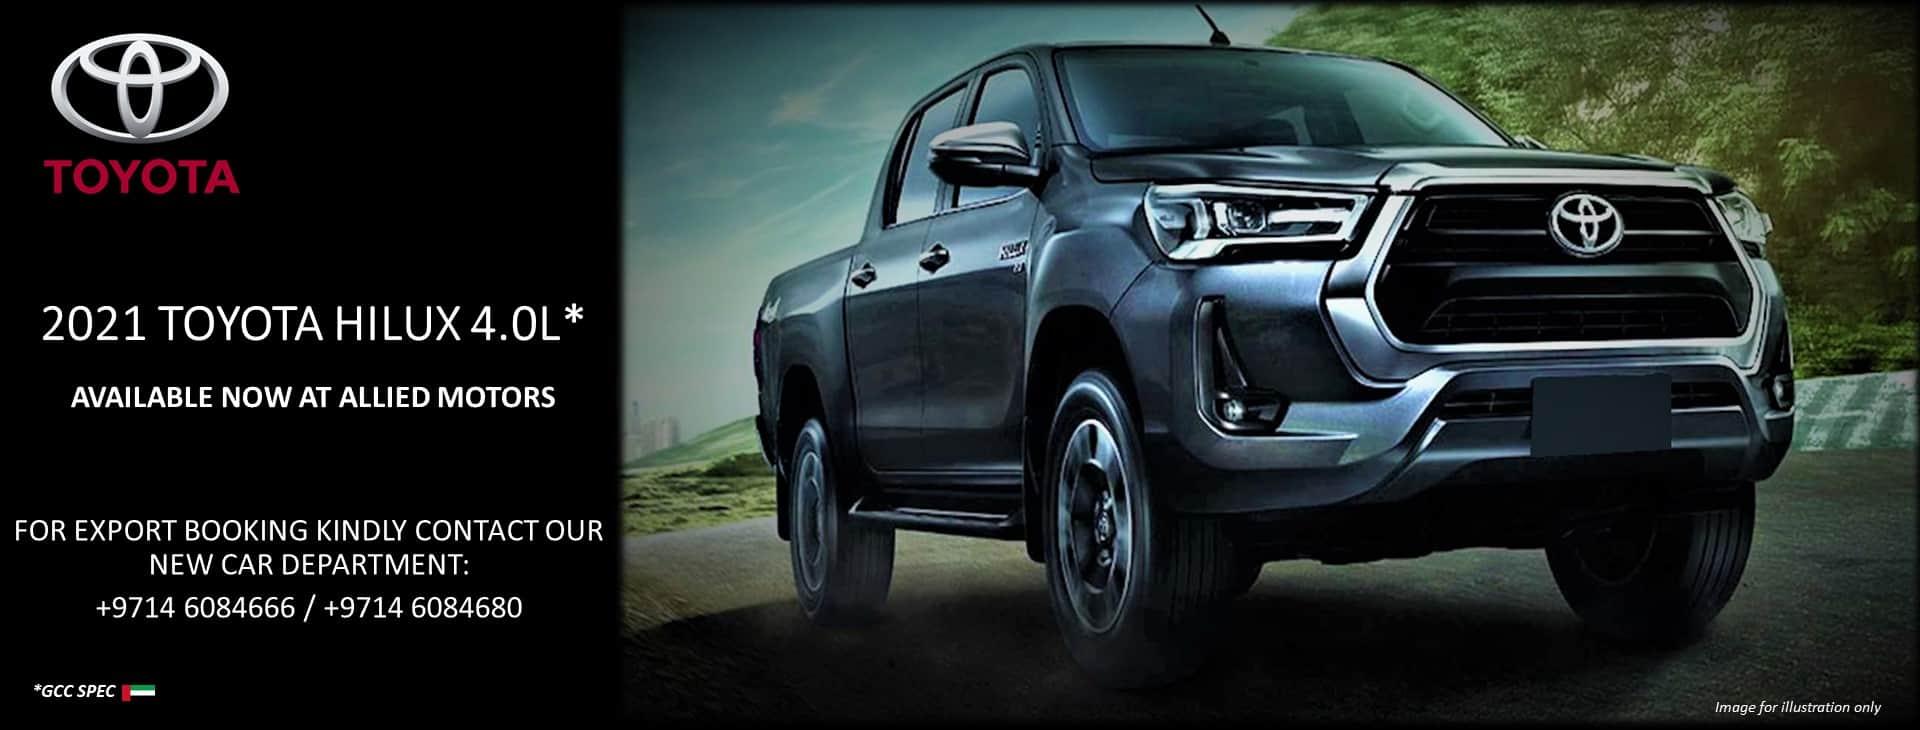 Toyota Hilux 4.0L 2021